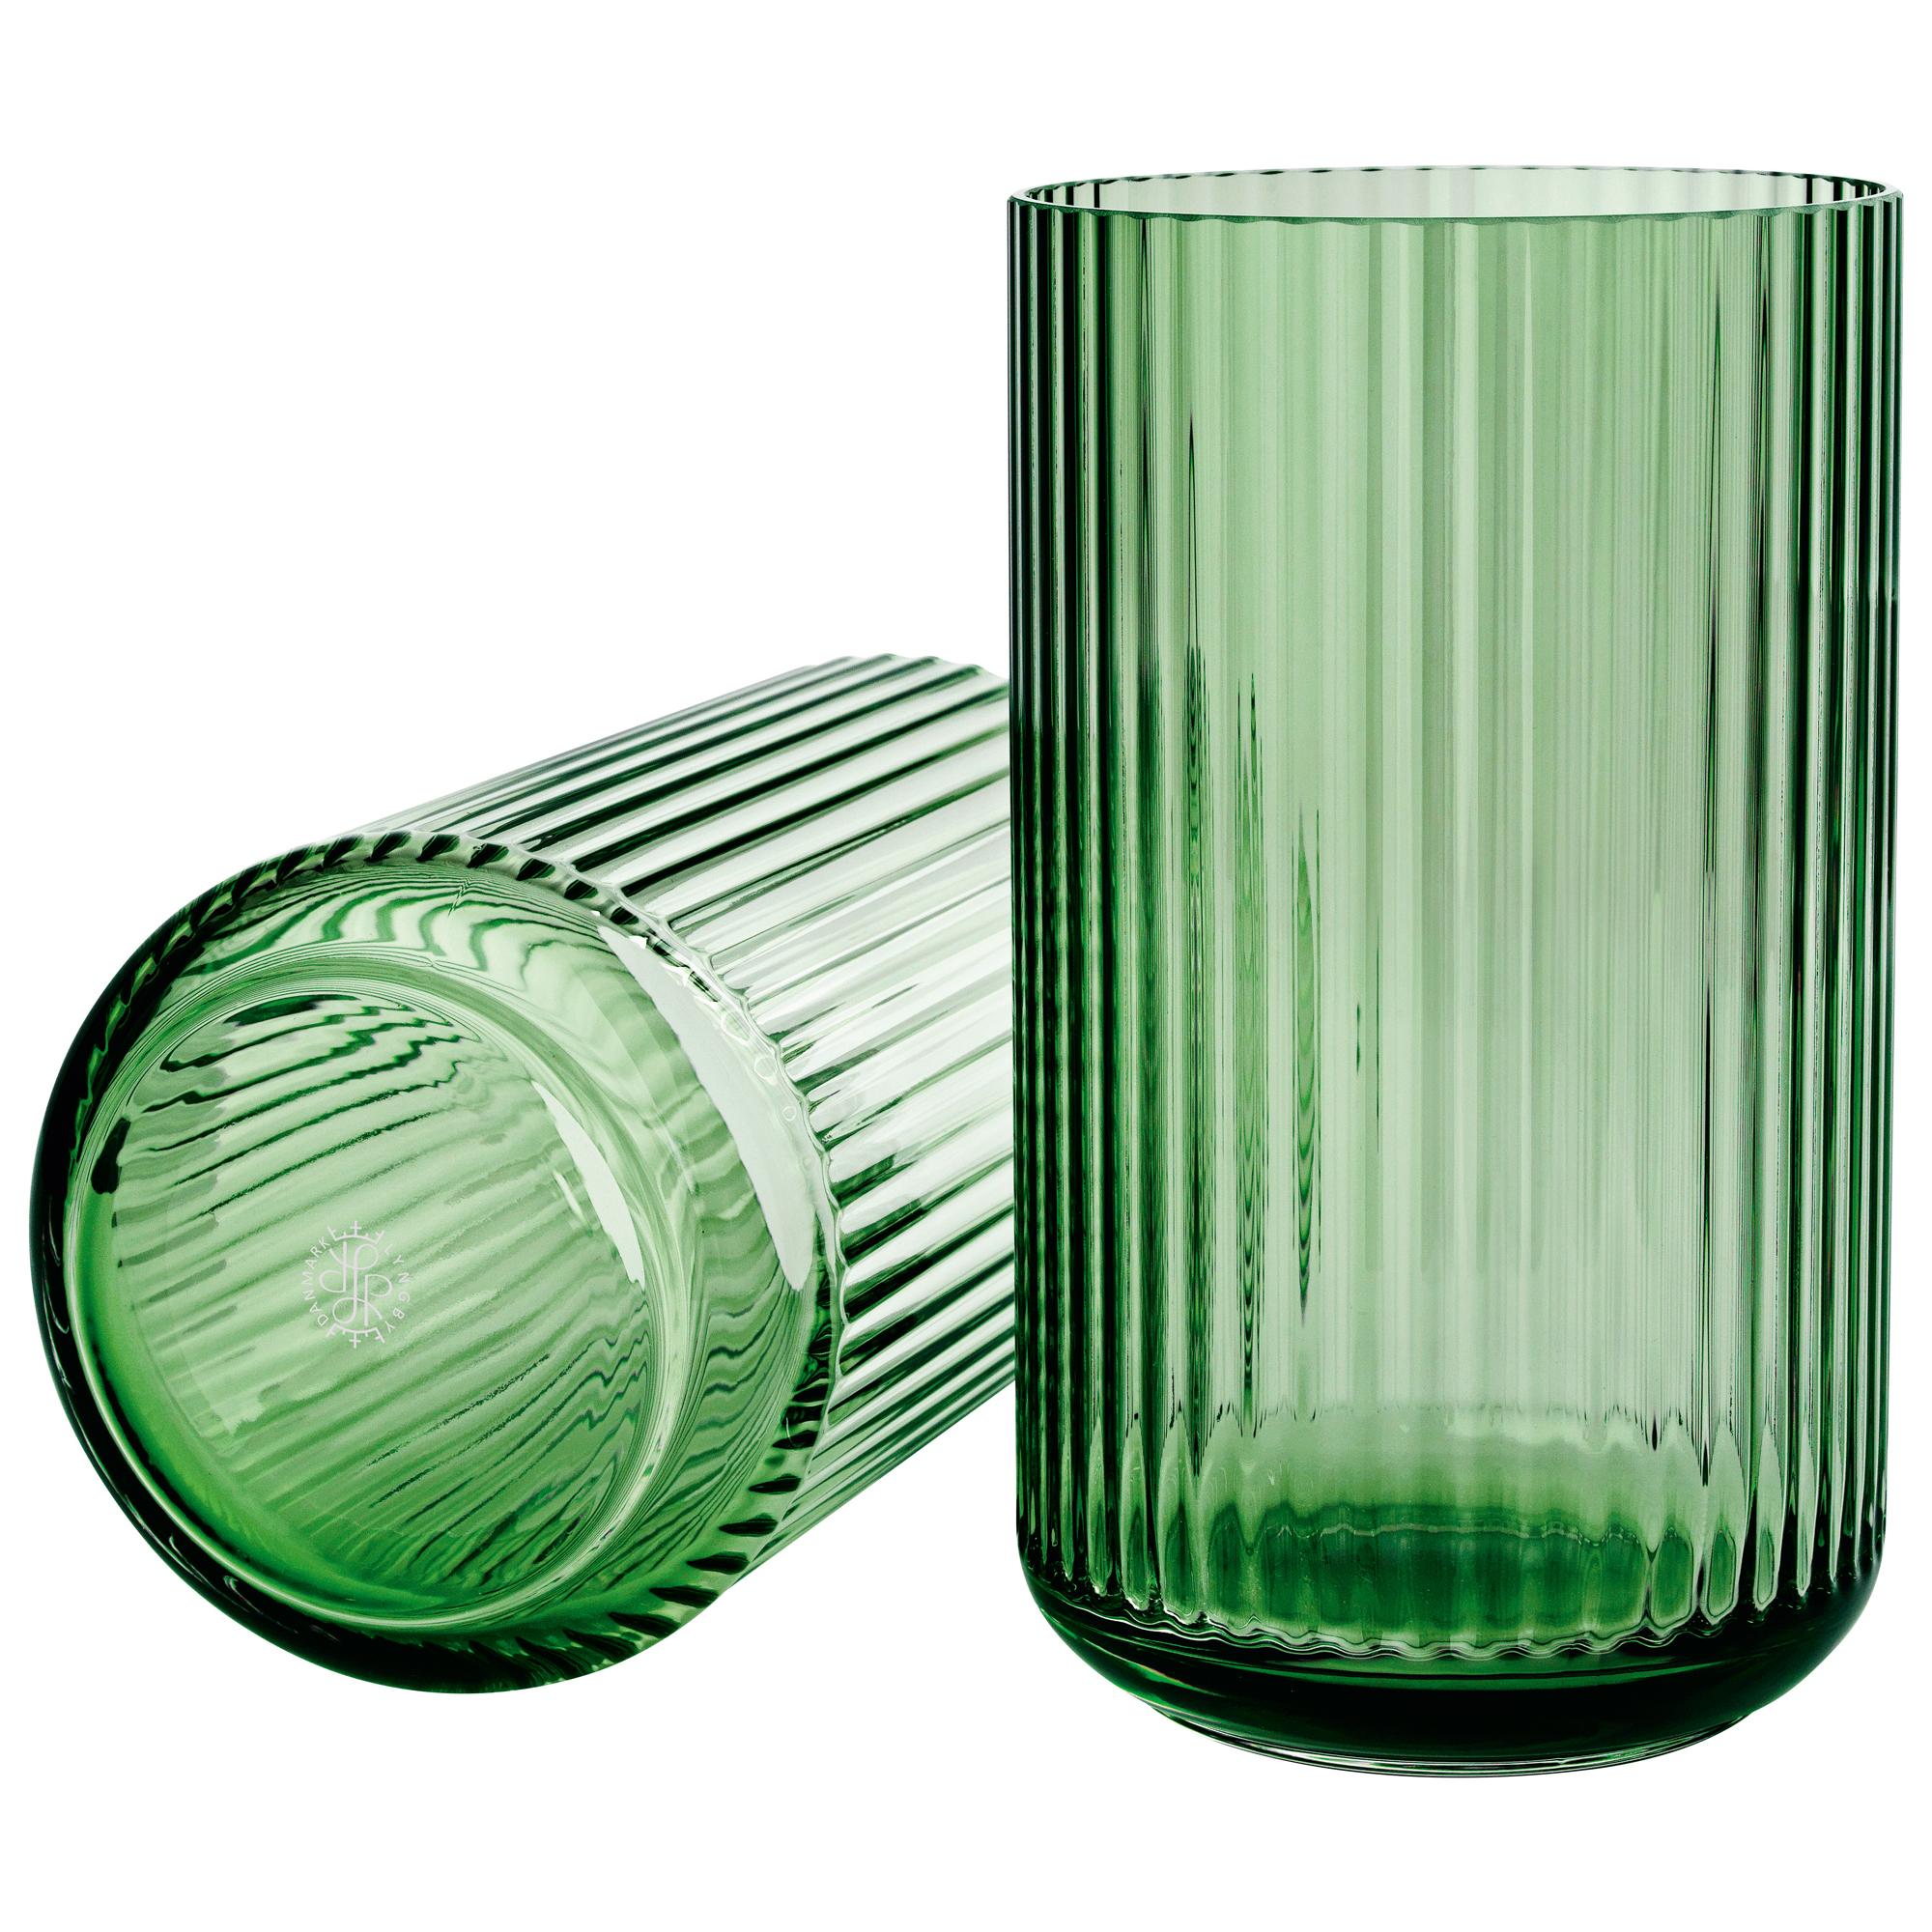 Lyngby Vase Glas Grün Online Kaufen Fiolinide